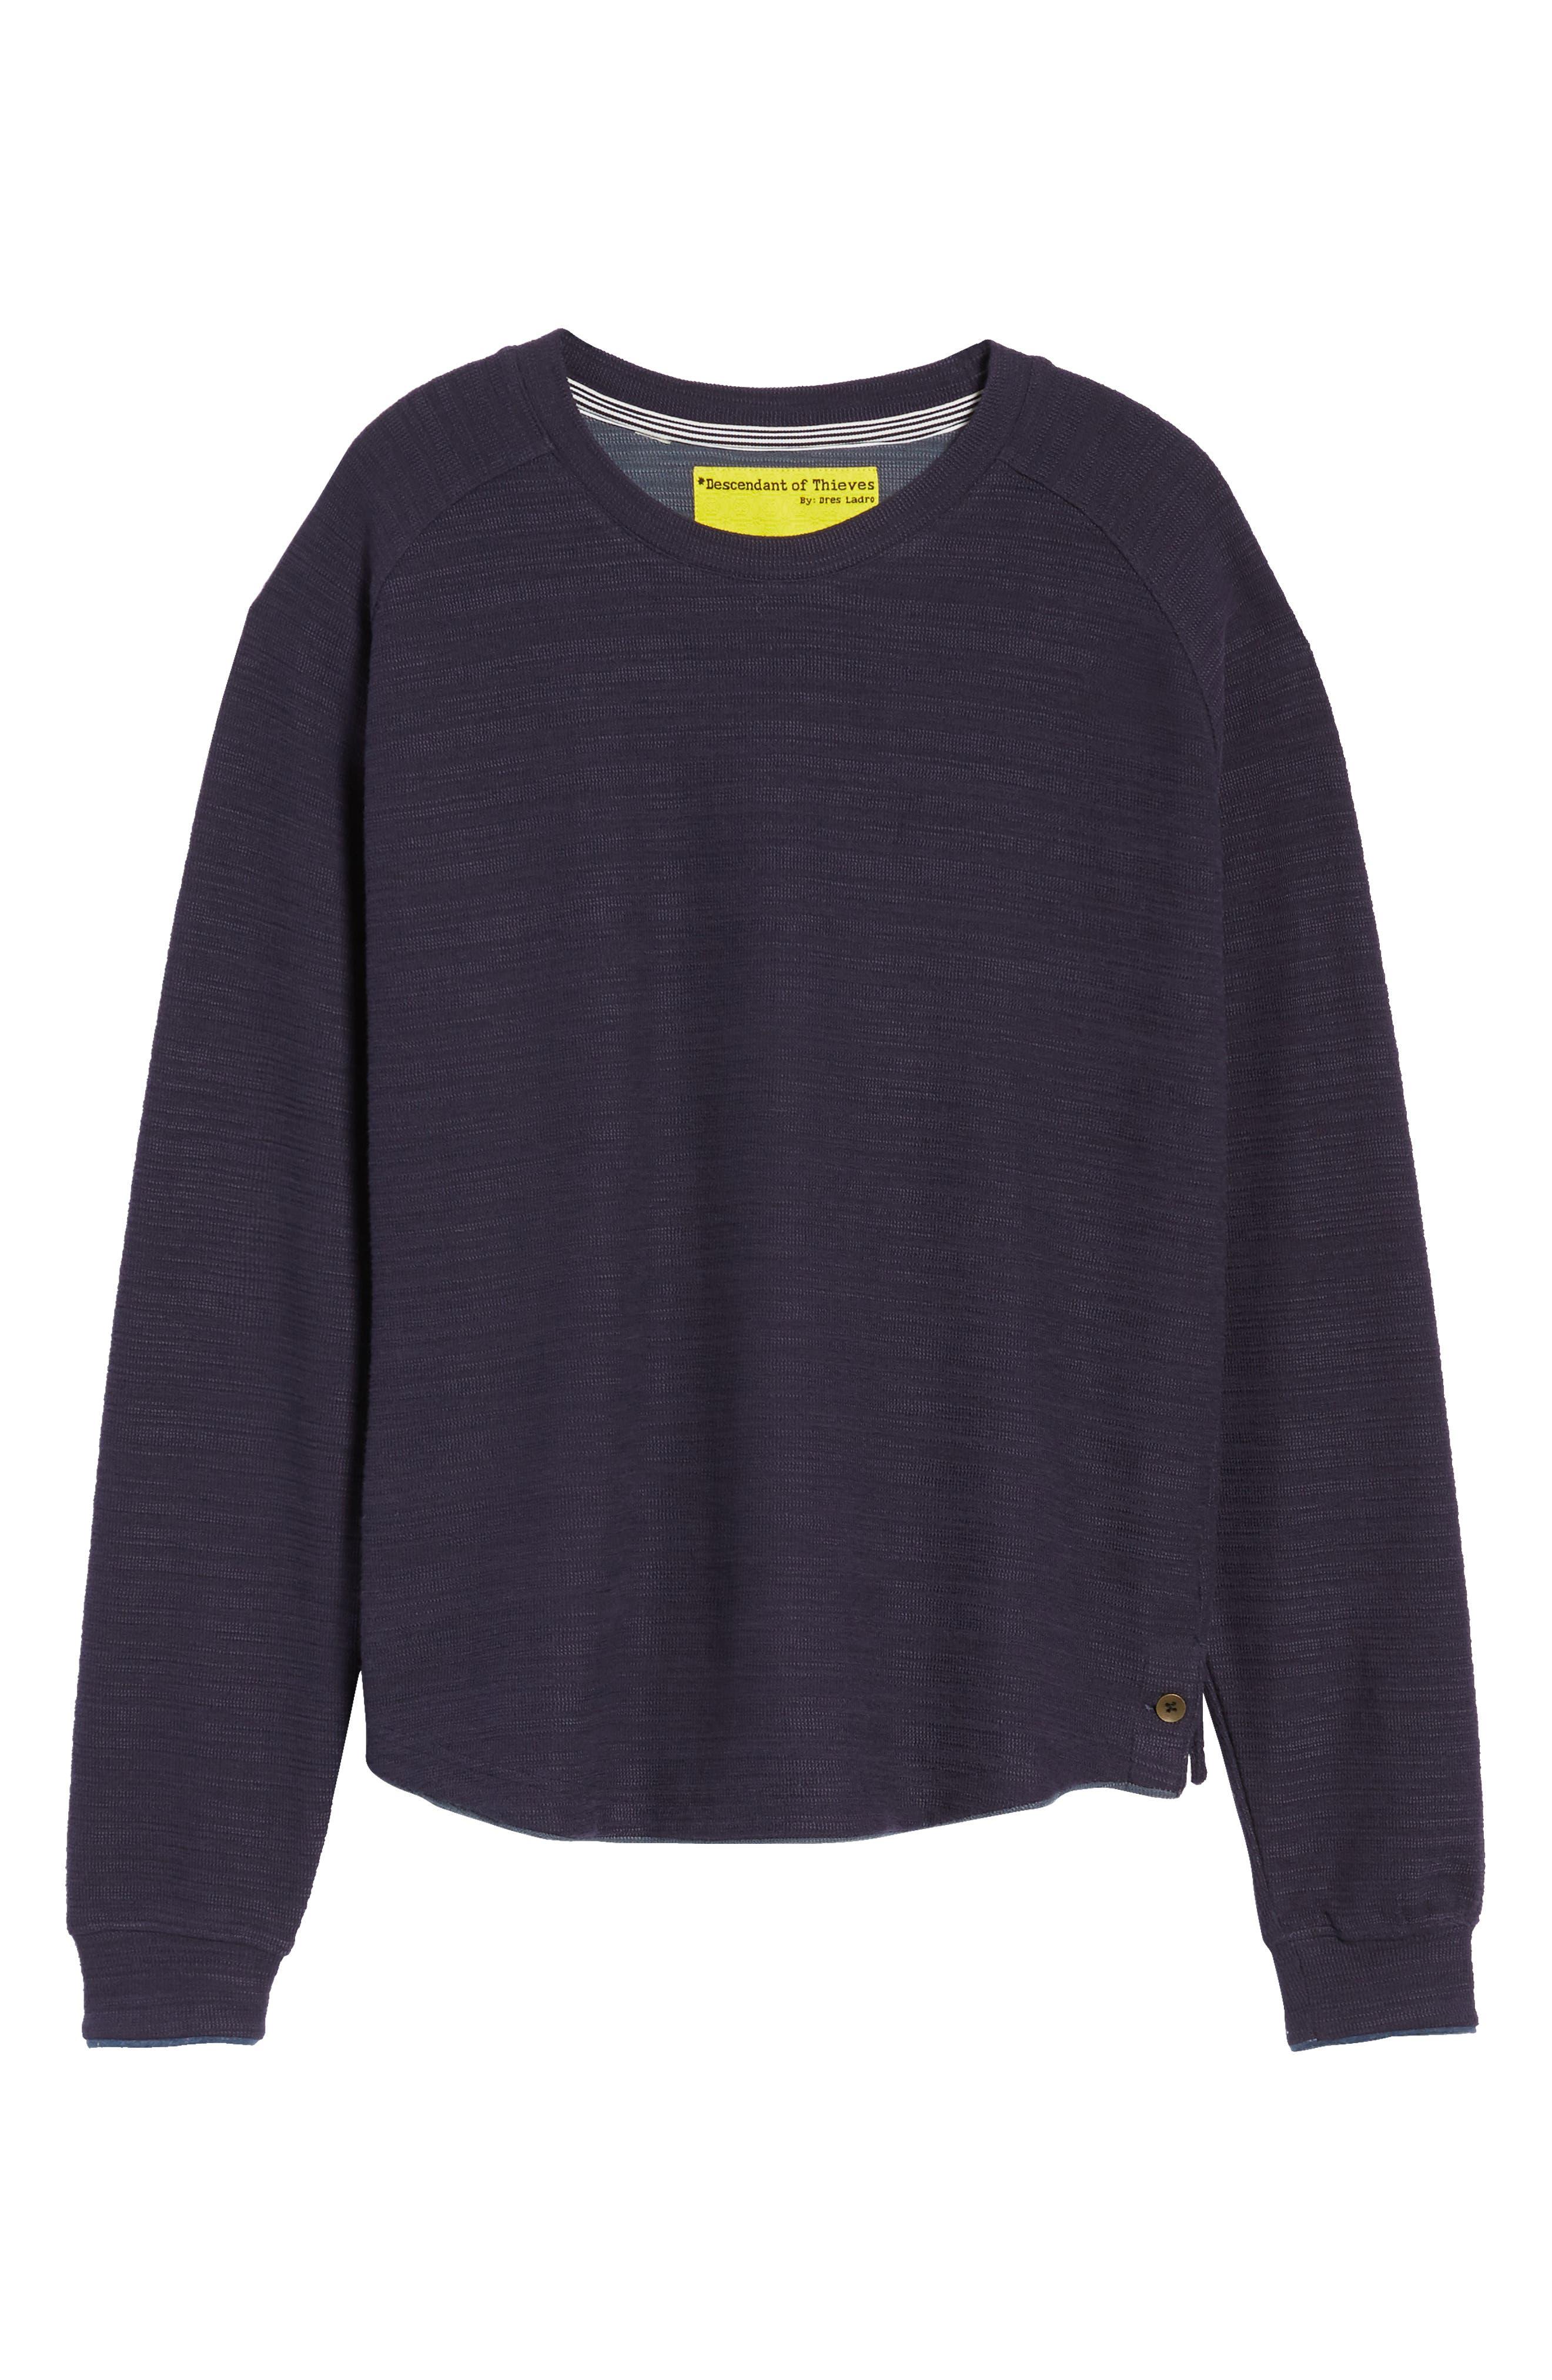 250 Loft Slubbed Crewneck Sweater,                             Alternate thumbnail 6, color,                             NAVY